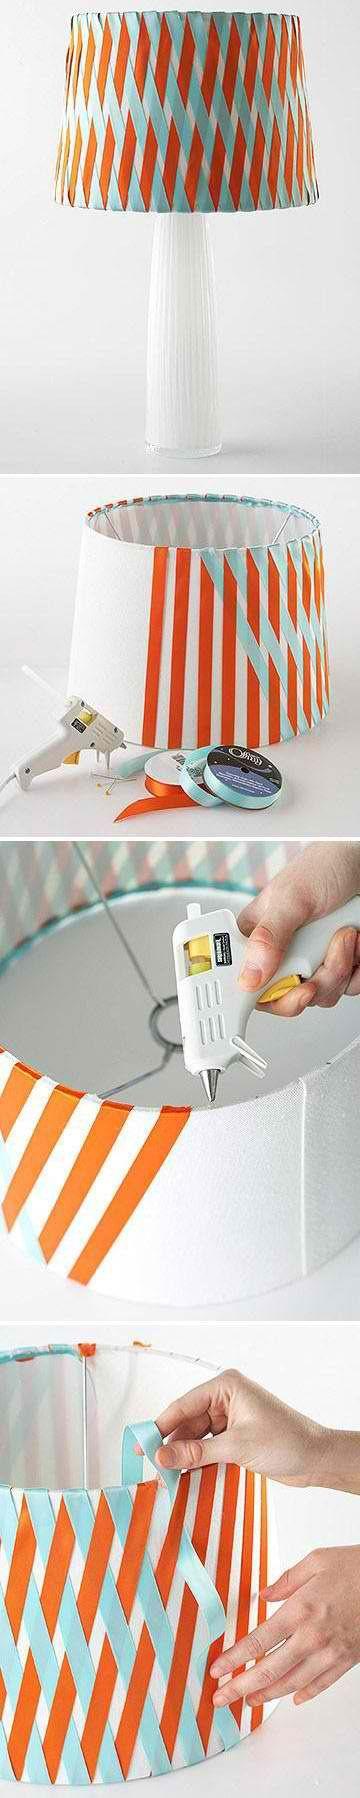 DIY Woven Ribbon Lamp Shade  #HomeandGarden